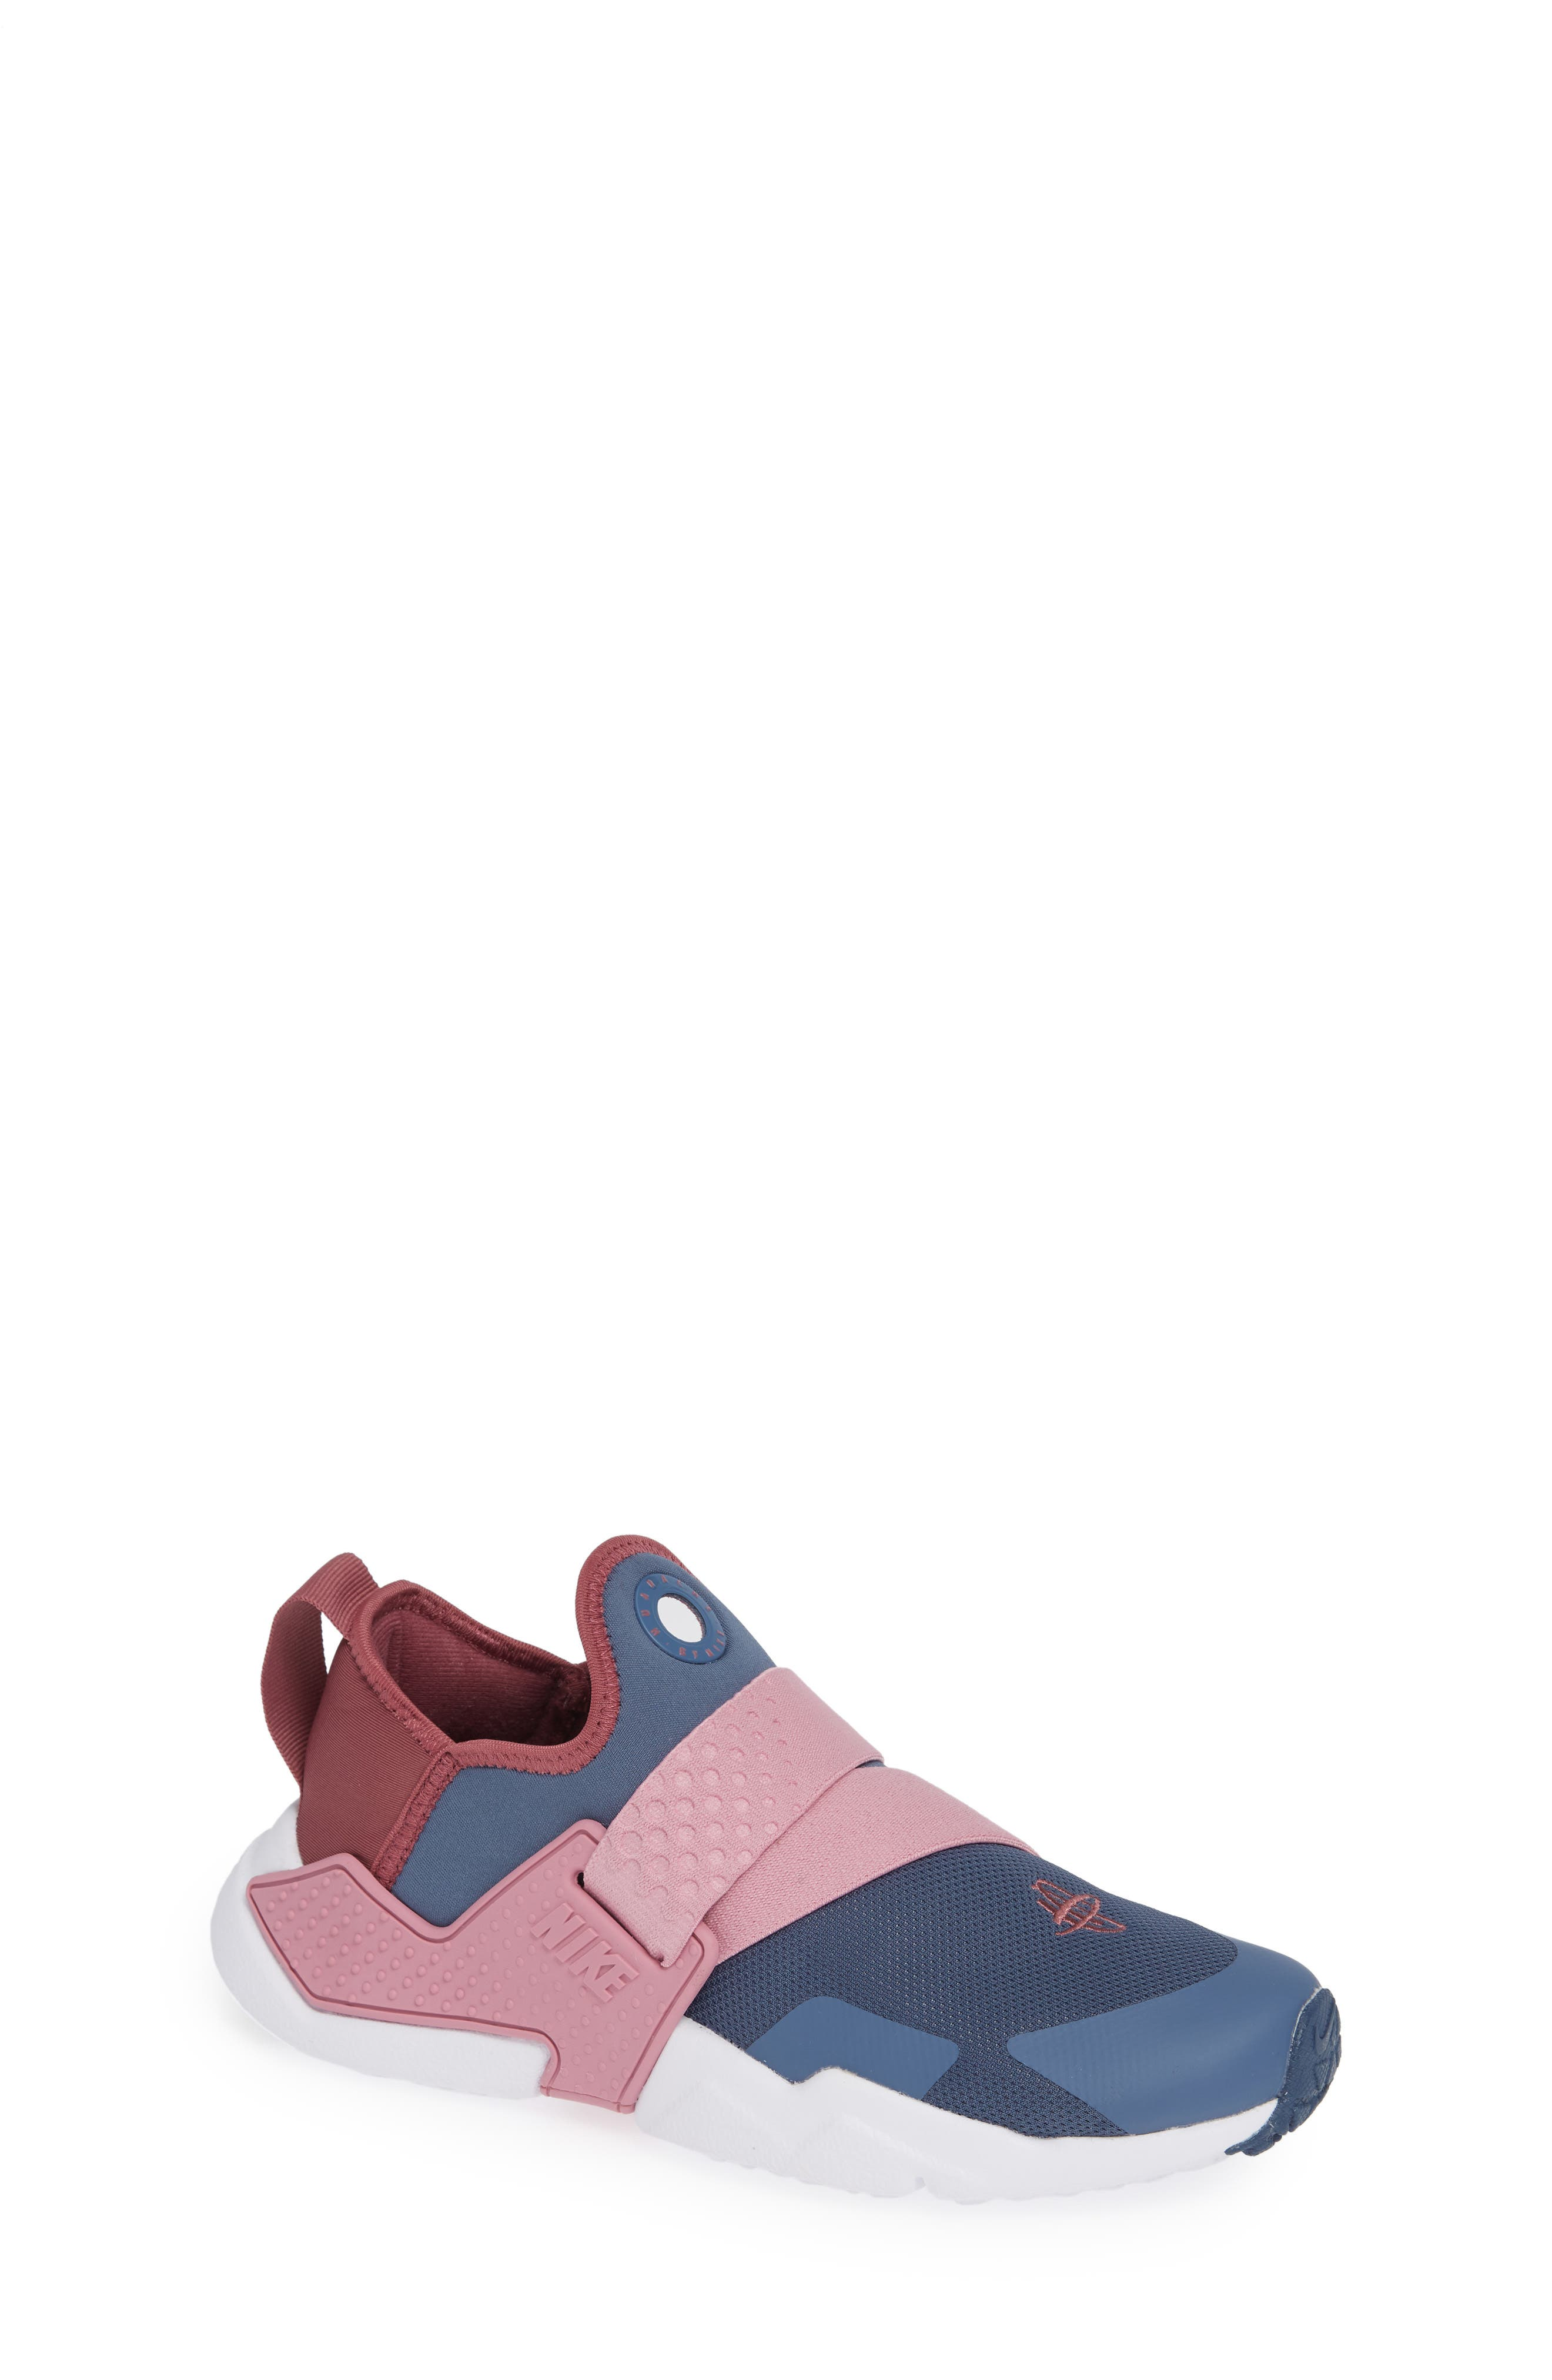 Huarache Extreme Sneaker,                             Main thumbnail 1, color,                             DIFFUSED BLUE